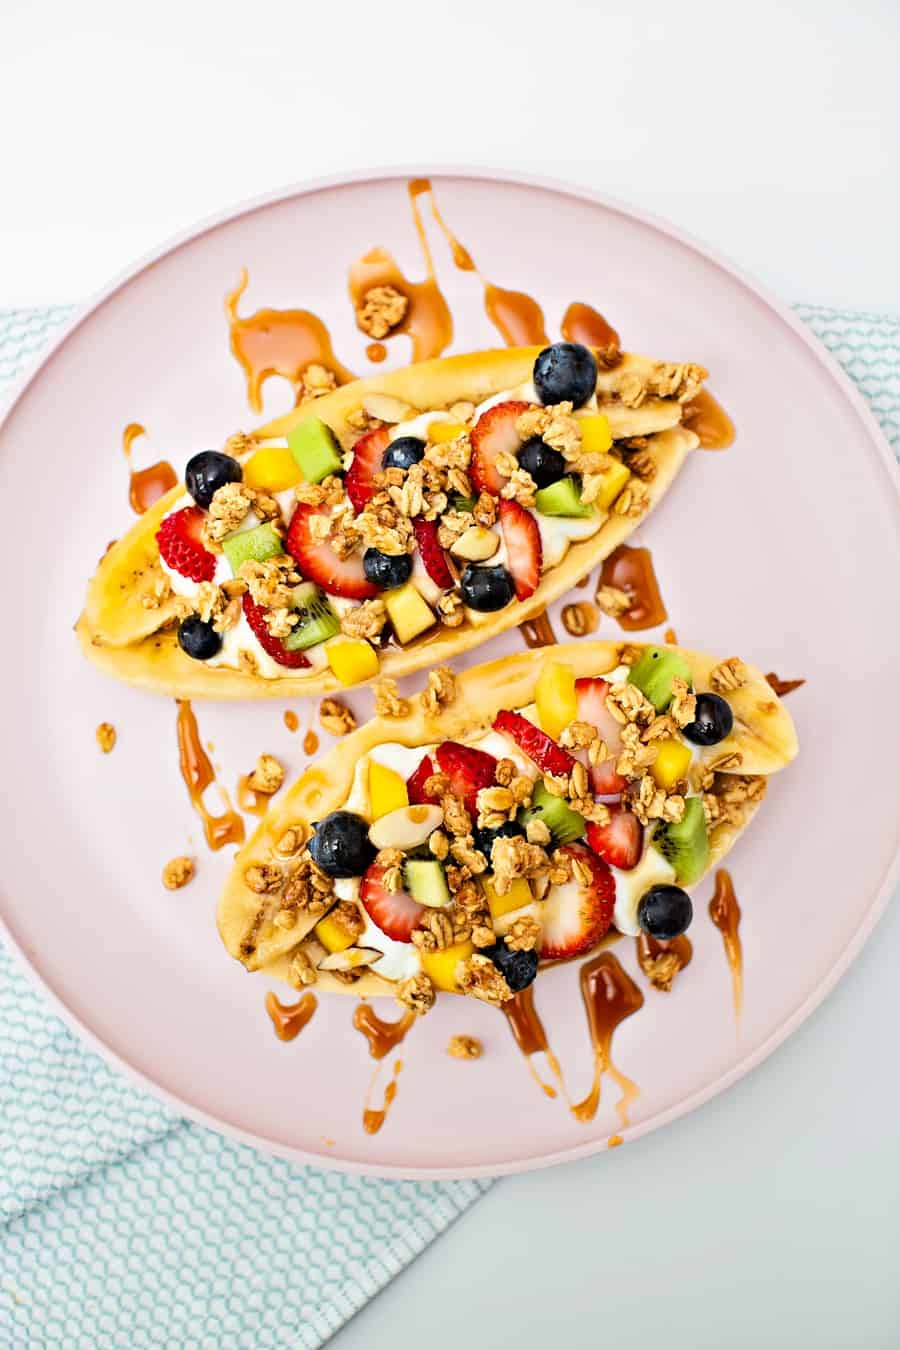 banana splits made healthy with fruit and yogurt